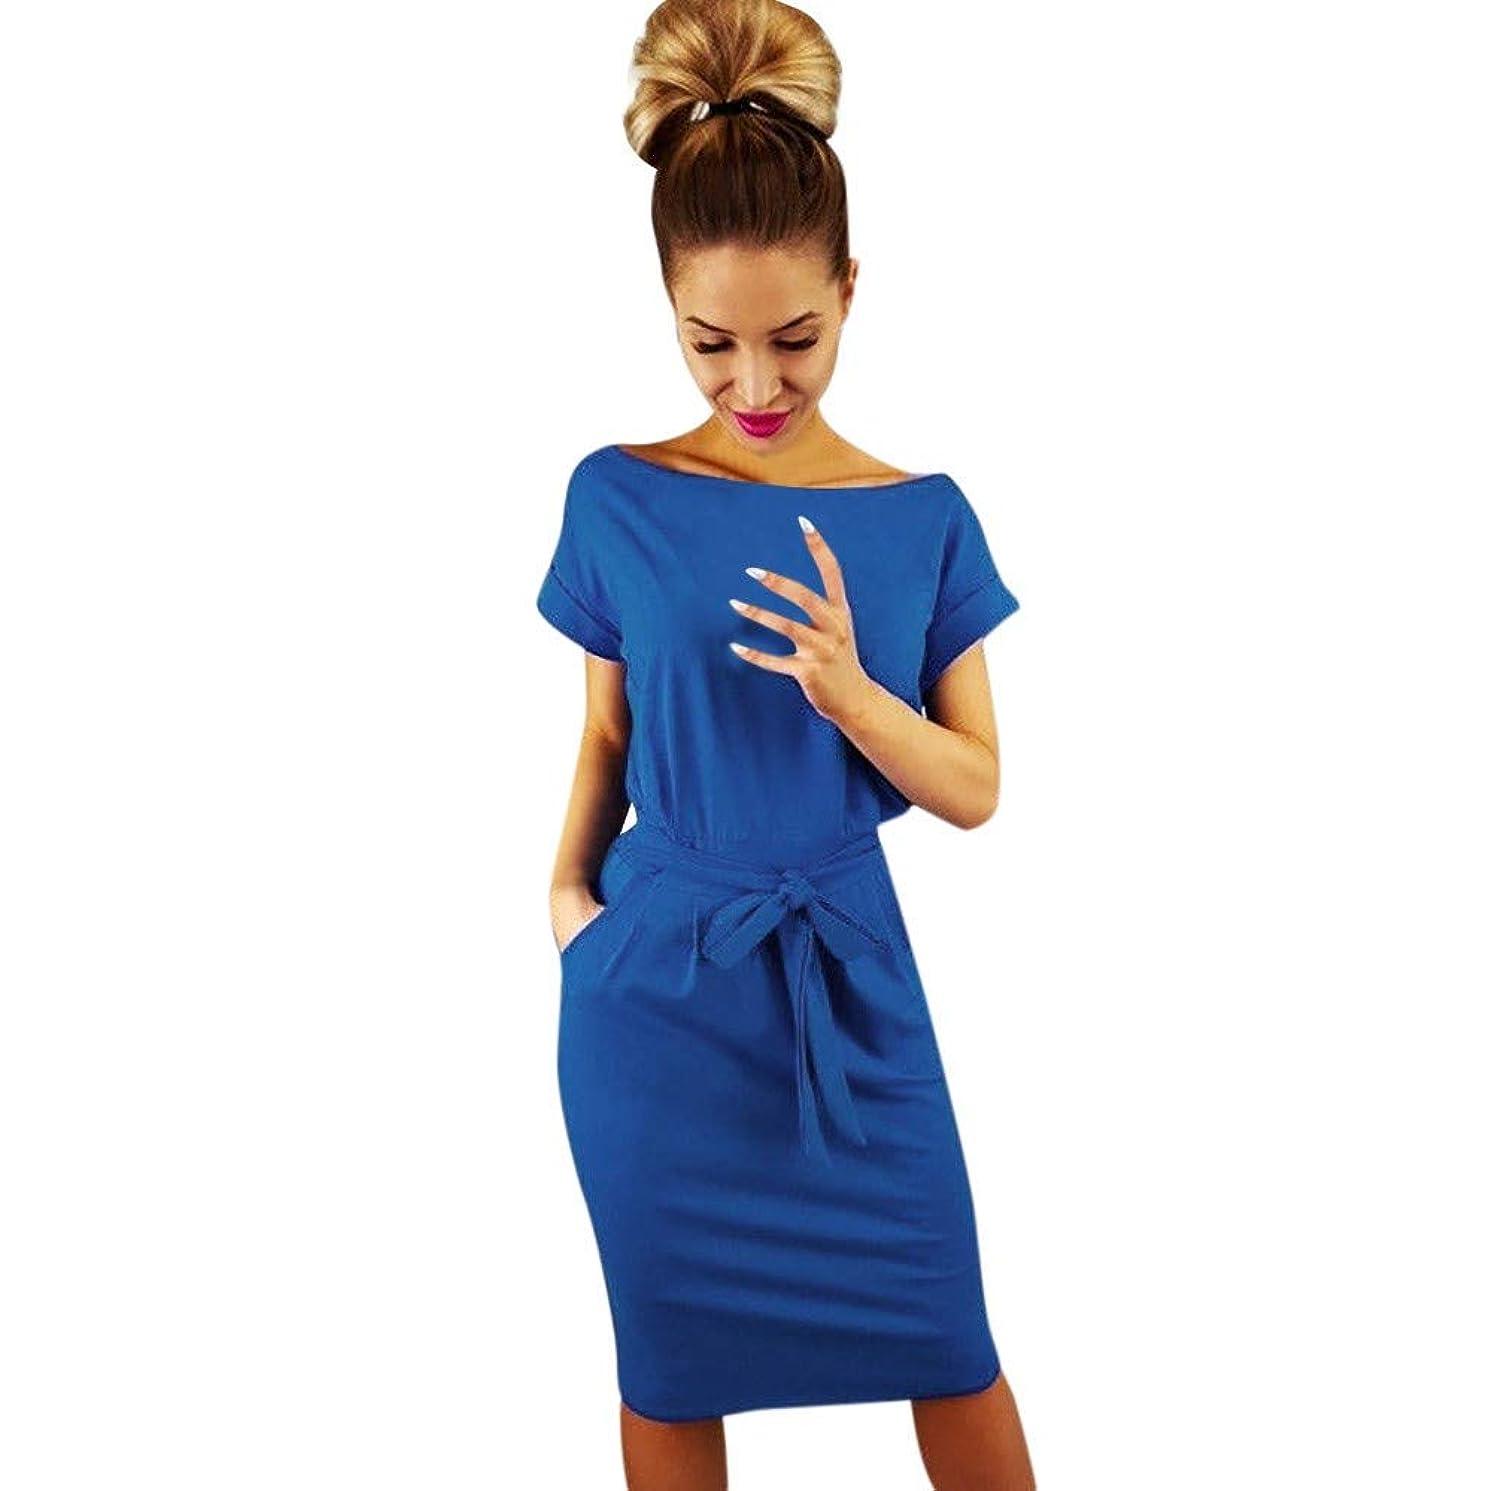 Adeliber Women's Short Sleeve Dress Casual Pocket Summer Solid Color Belt Party Mini Dress